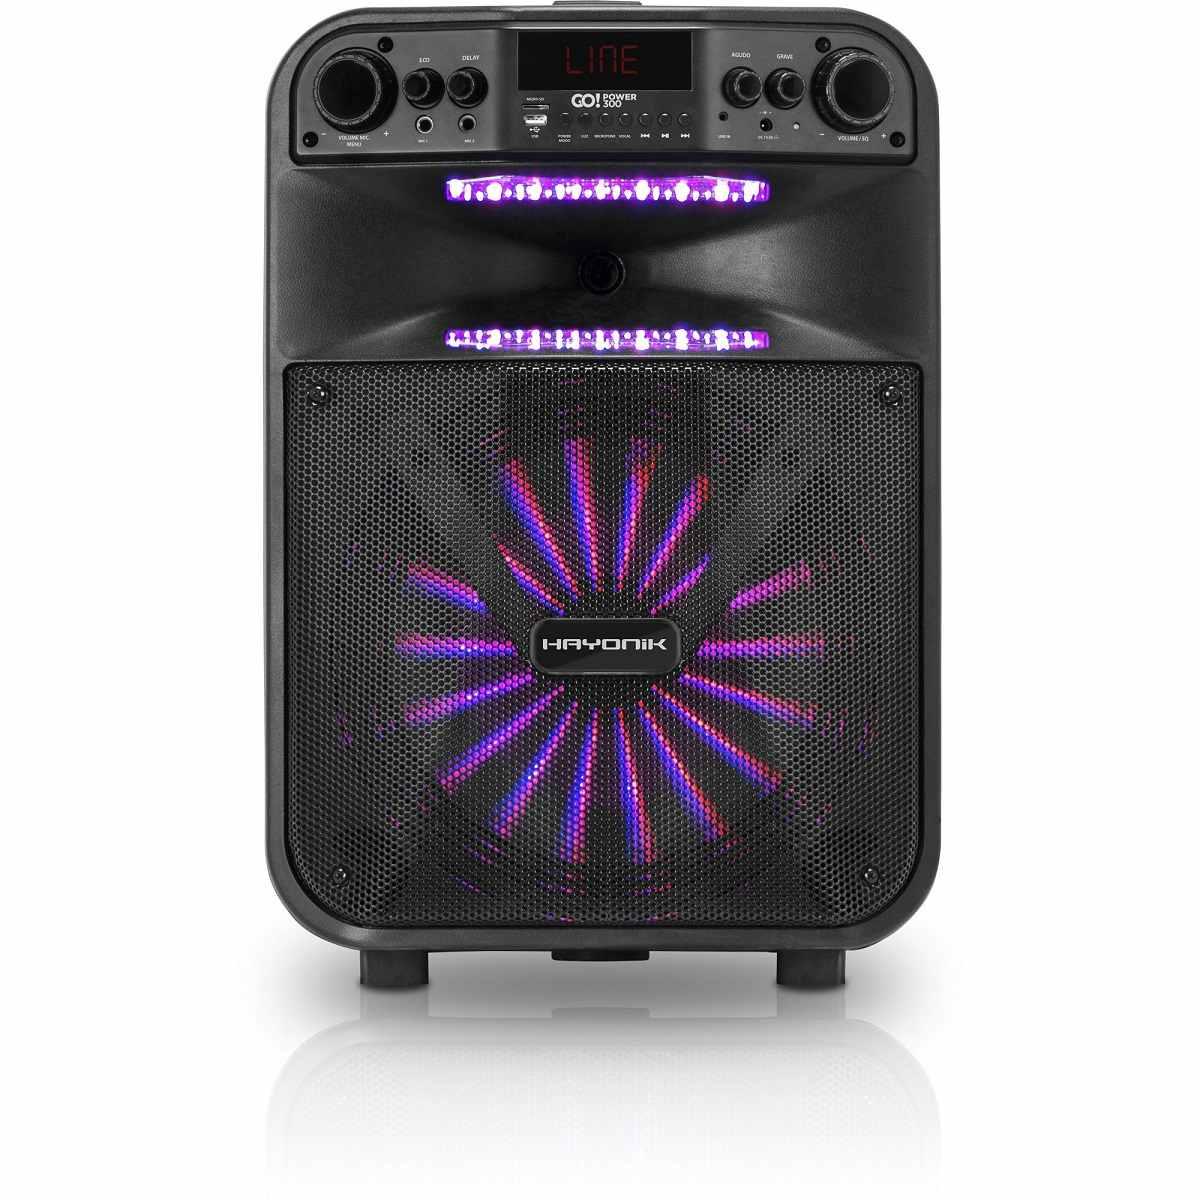 Caixa de Som Portátil Bluetooth/MicroSD/USB/FM 200W GOPOWER 300 Hayonik